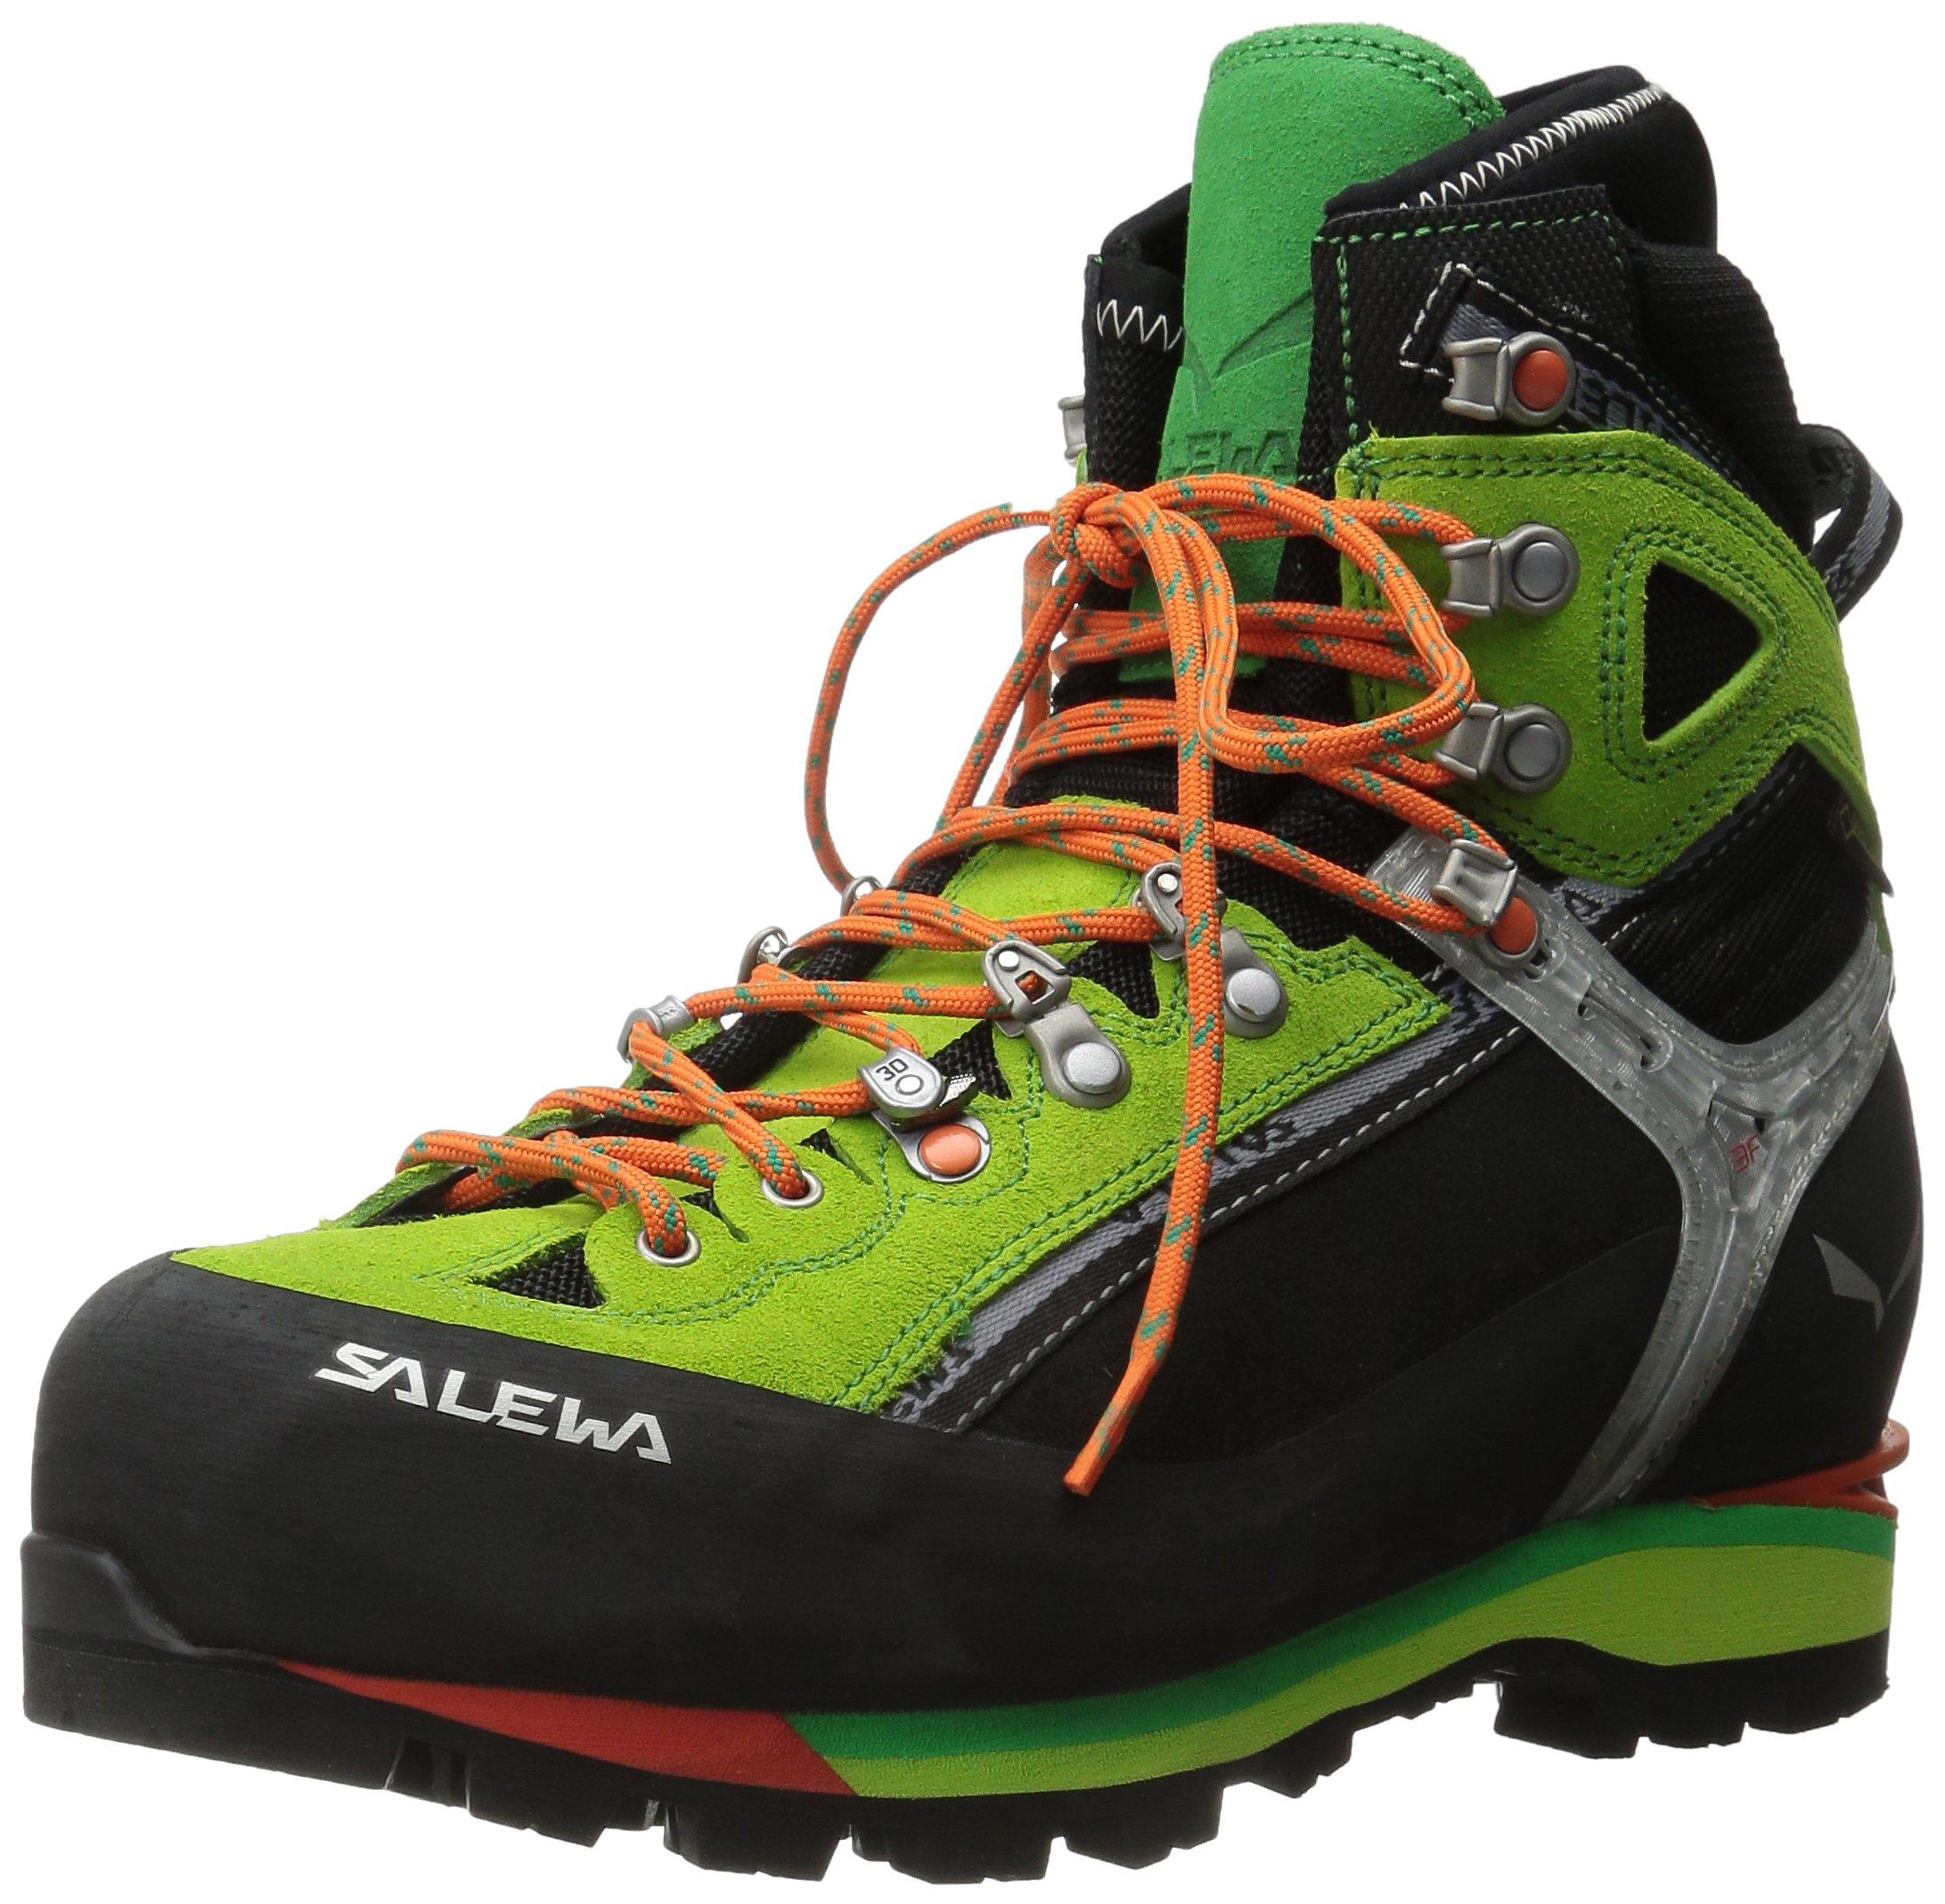 Salewa men 39 s ms condor evo gtx m mountaineering boot for Salewa amazon